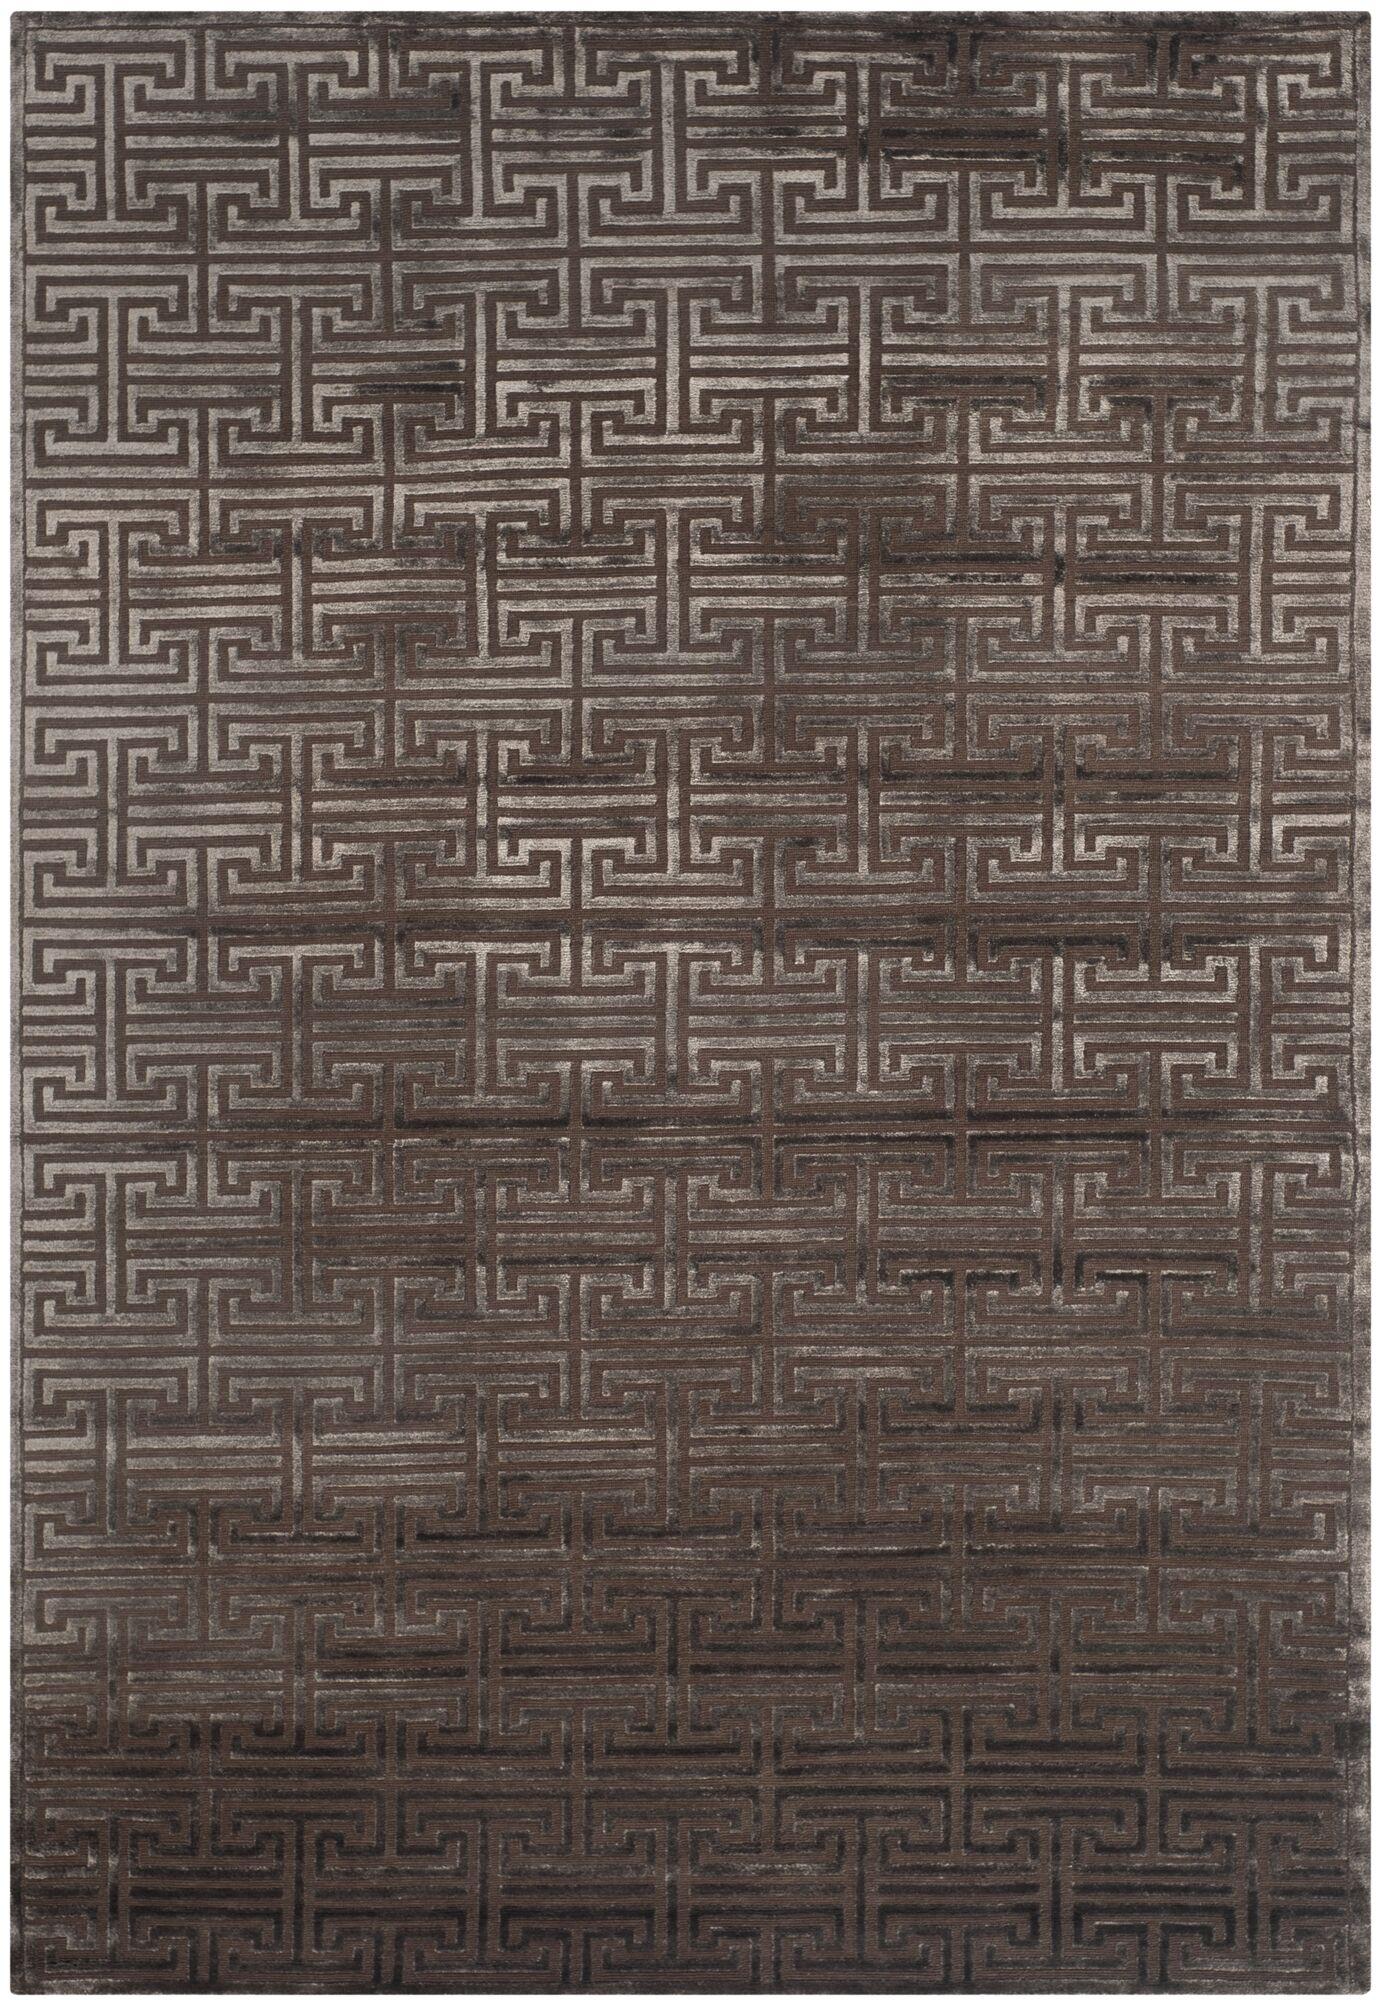 Fogg Tibetan Hand Knotted Brown Area Rug Rug Size: Rectangle 10' x 14'